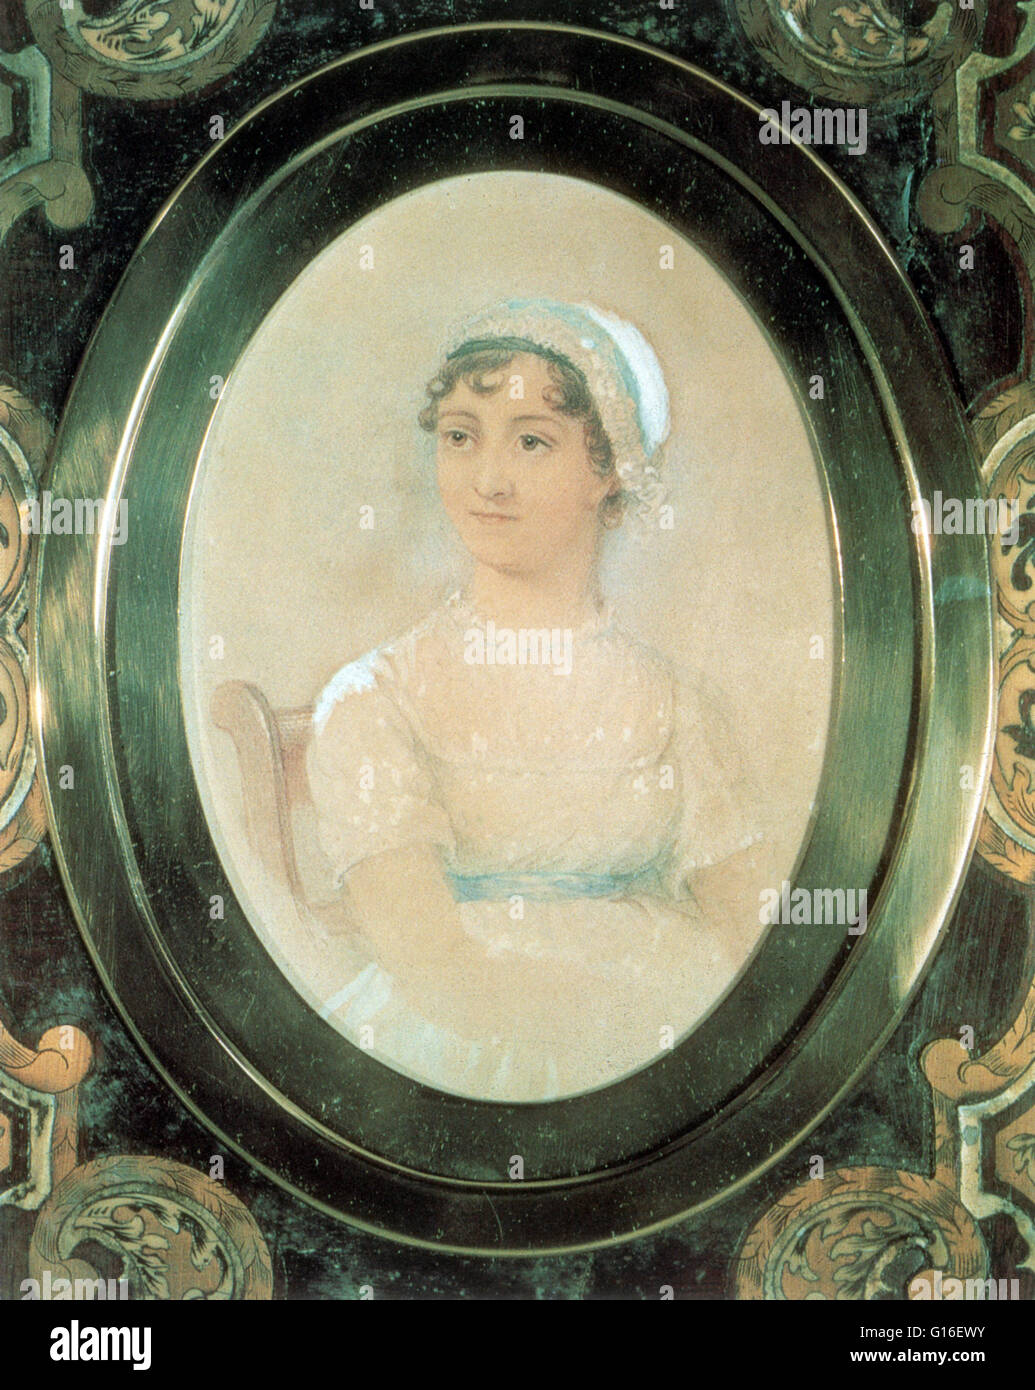 Retrato de Jane's hermana Cassandra. Jane Austen (16 de diciembre de 1775 - 18 de julio de 1817) fue un novelista Imagen De Stock